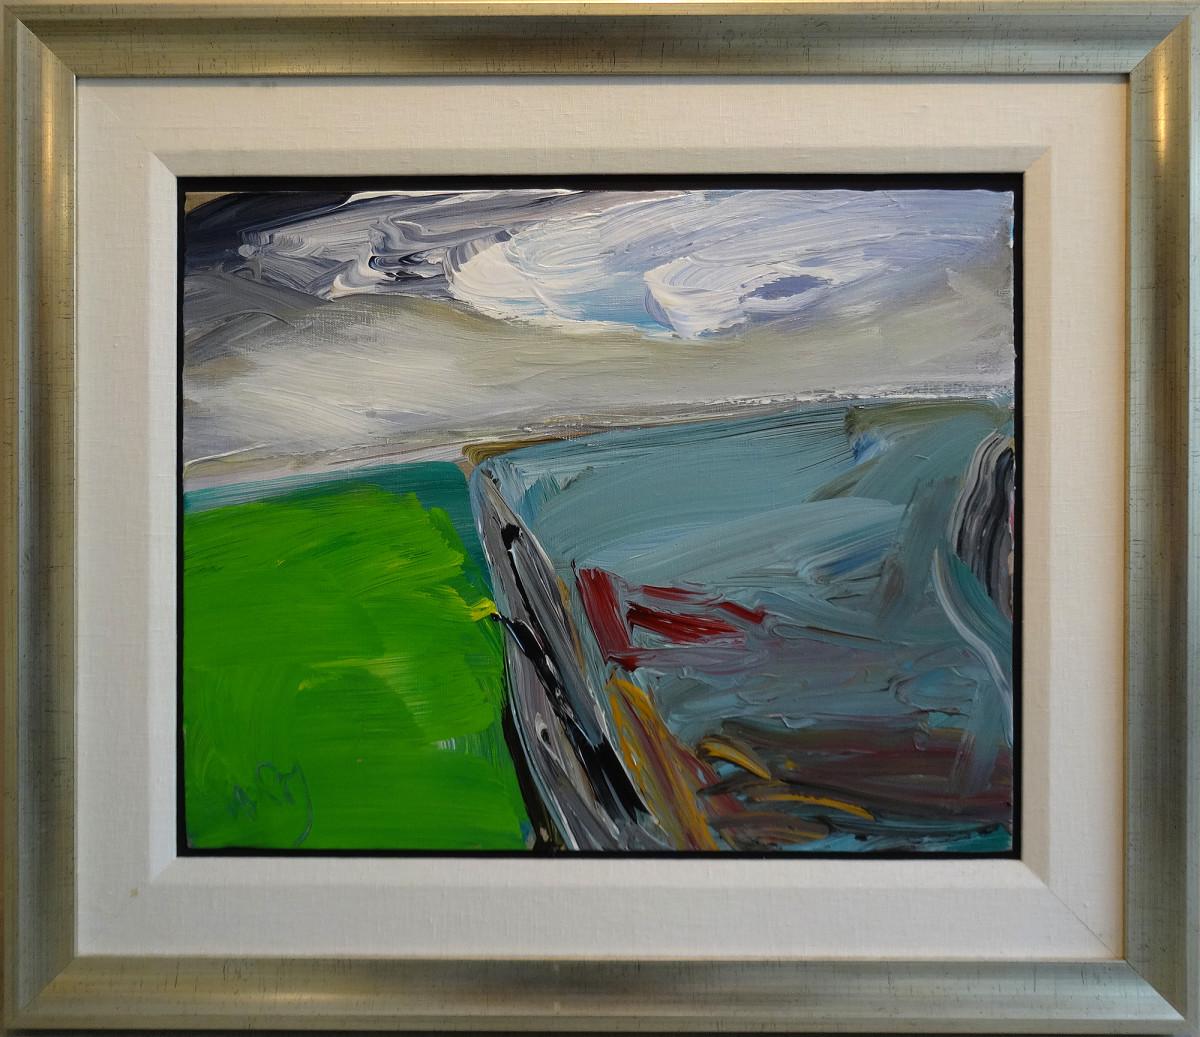 0266 - Angled Fields by Matt Petley-Jones